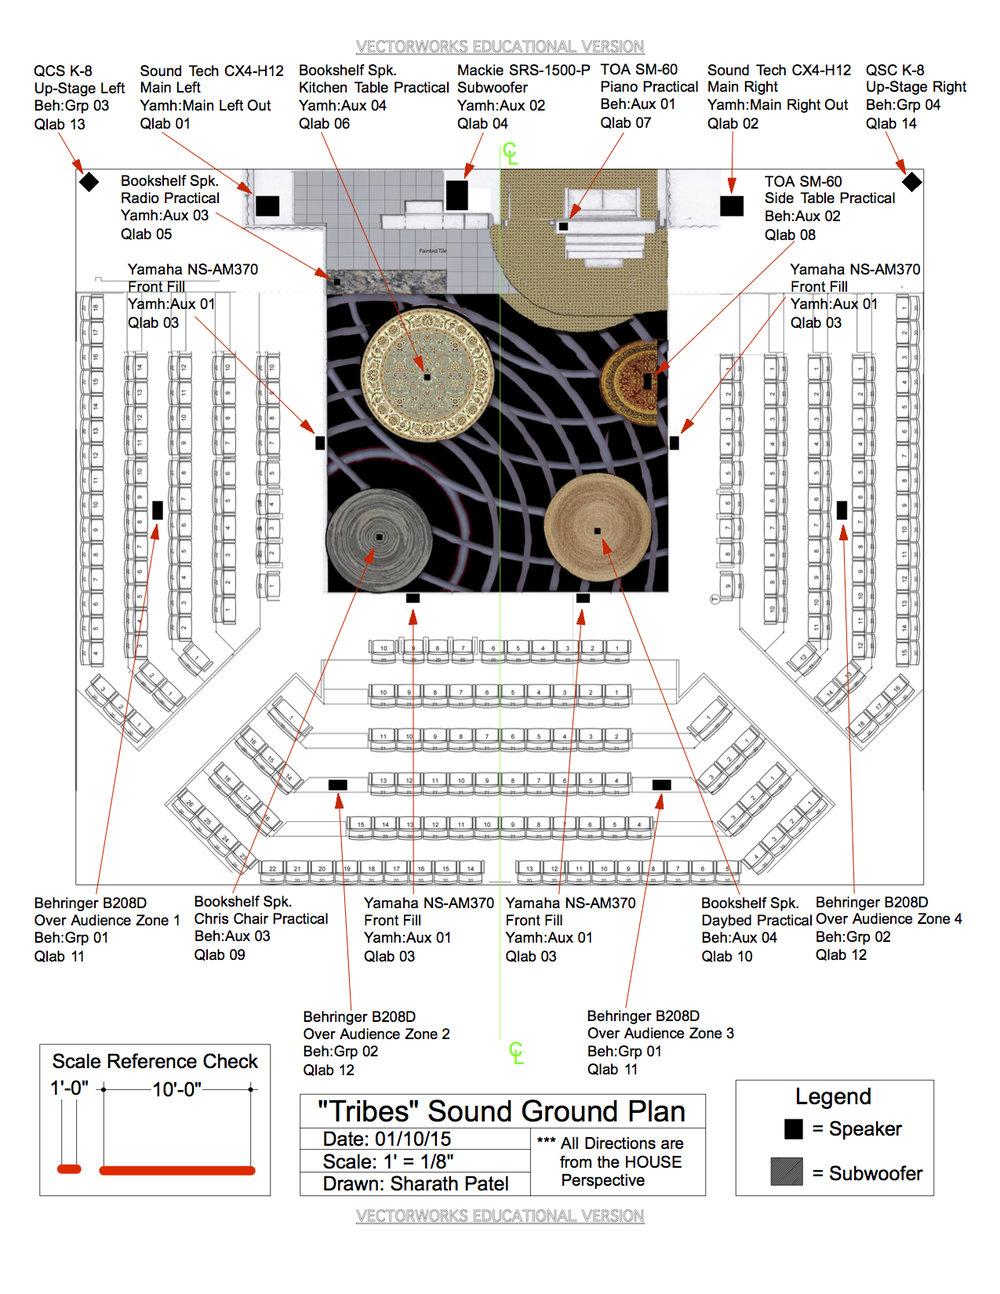 03 Tribes Sound Ground Plan 1-10-15 Digital v2.jpg